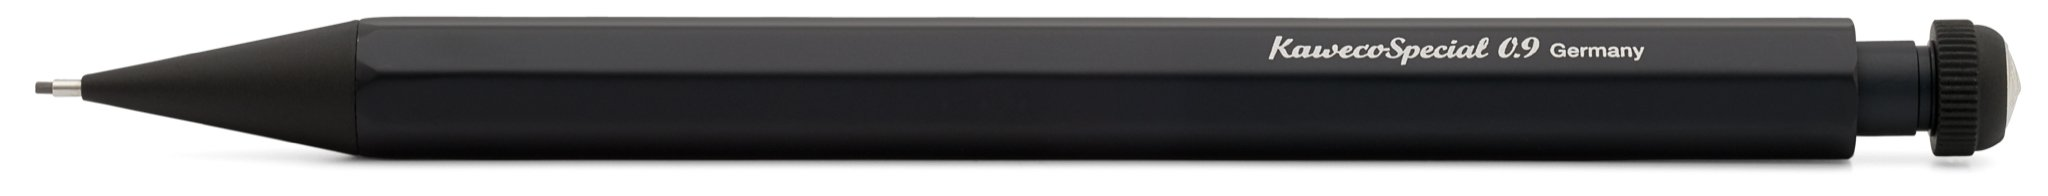 Kaweco Special Mechanical Pencil S short Black 0.9 mm